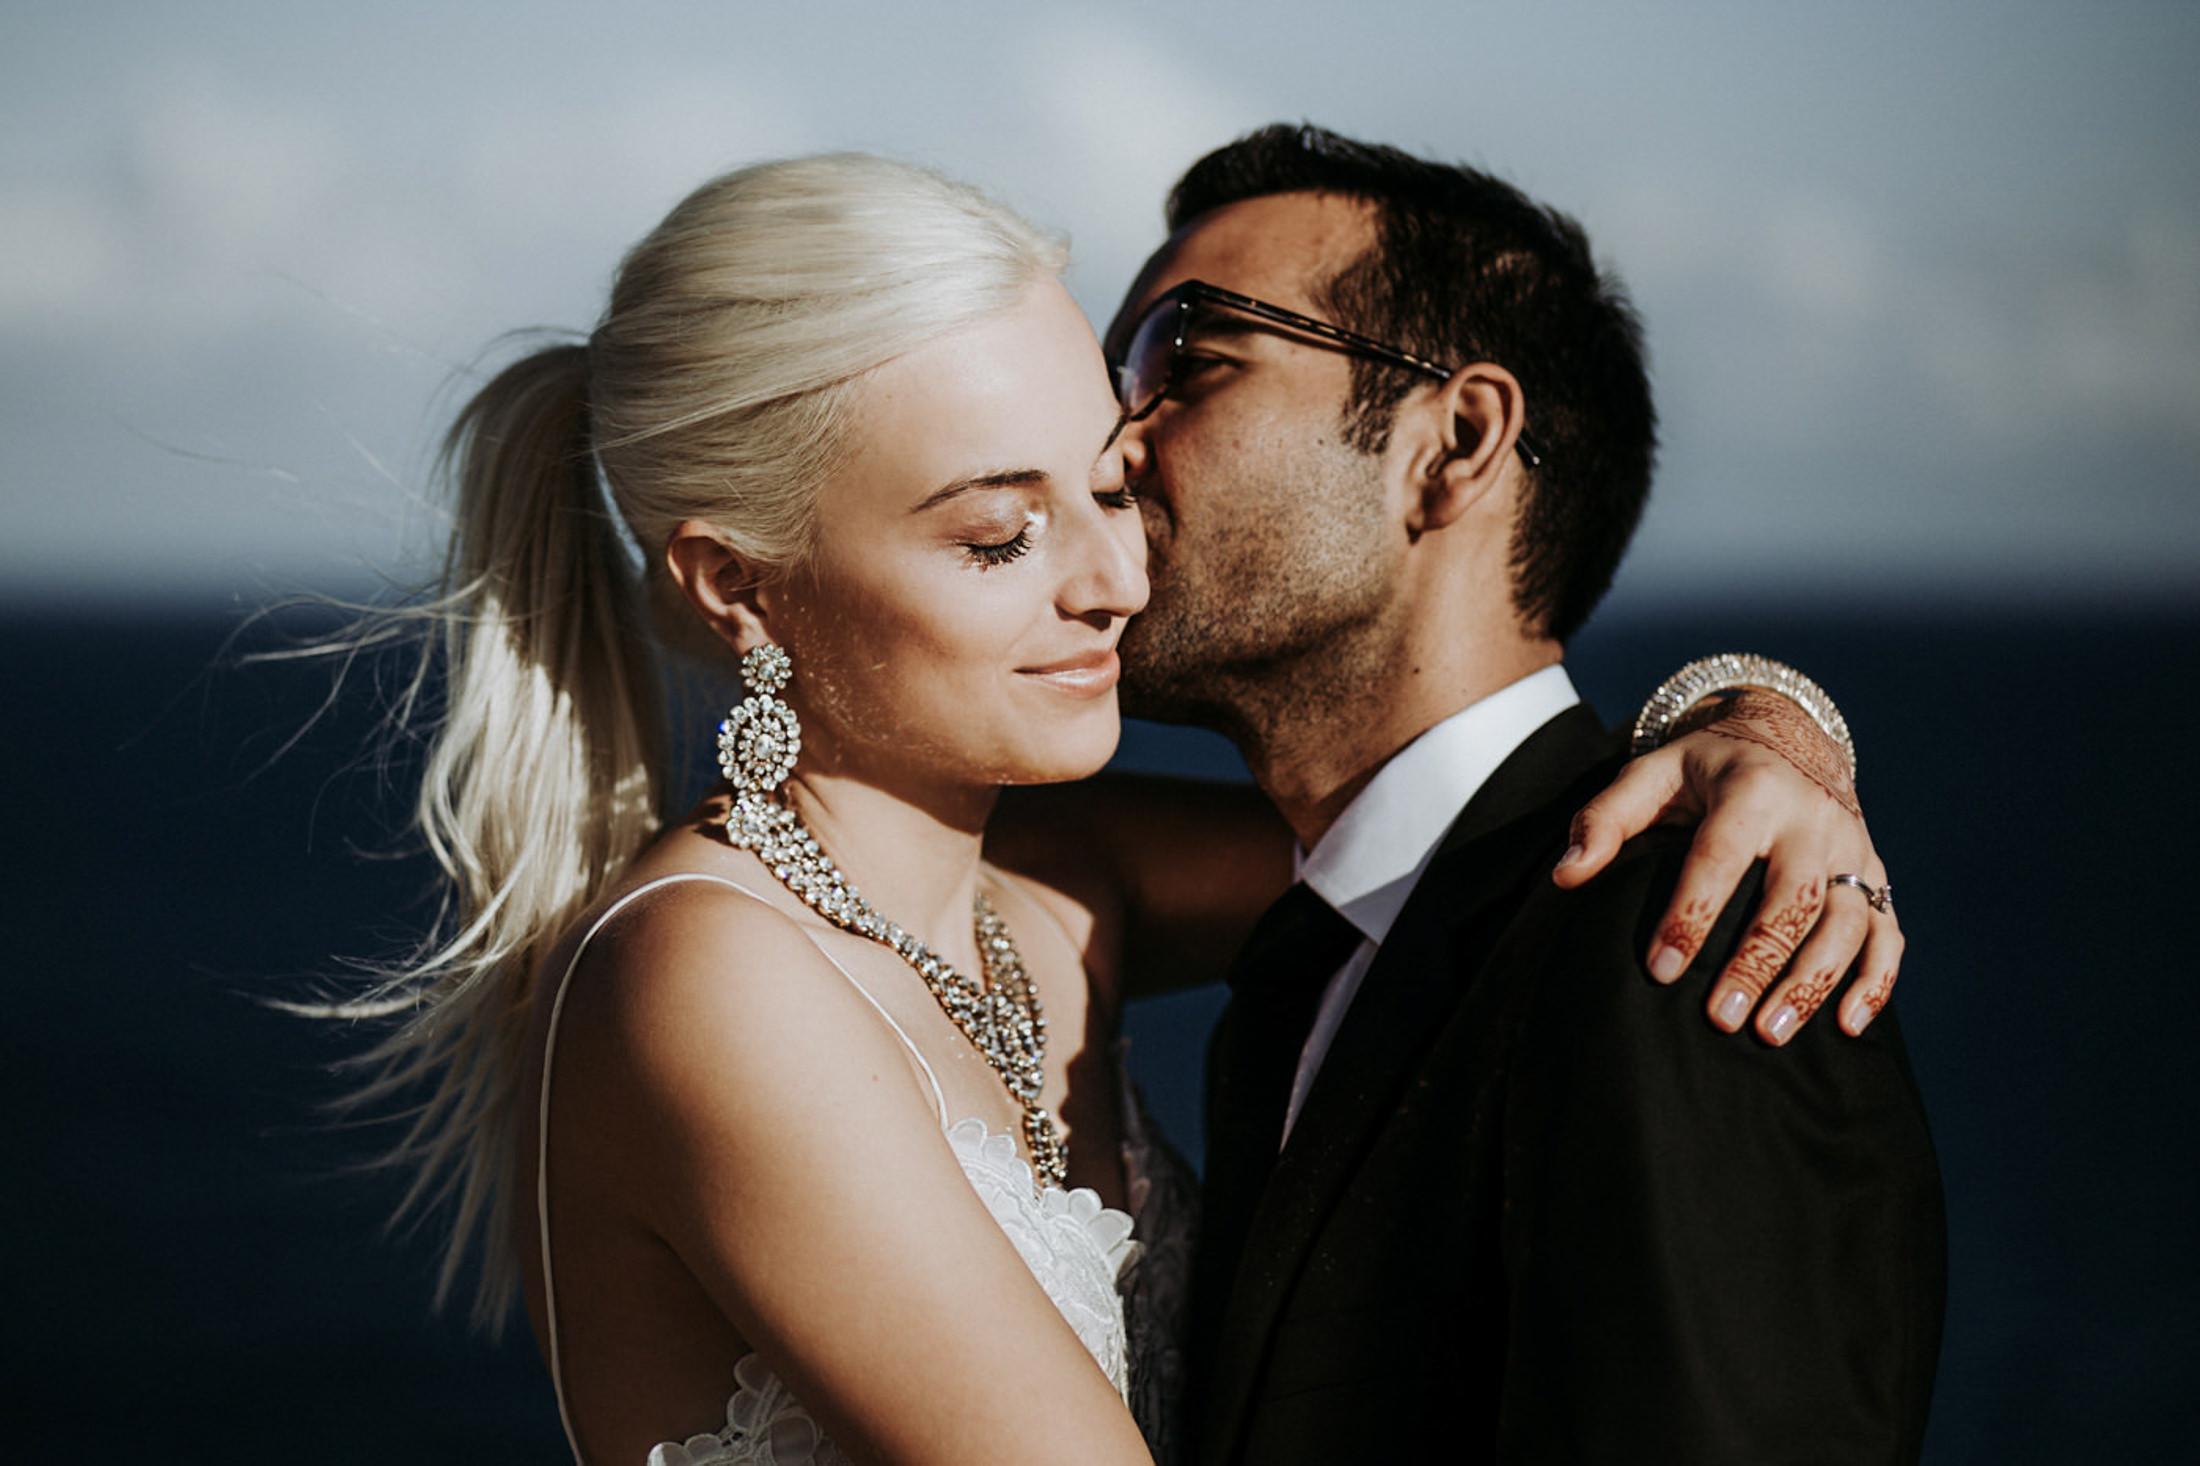 Wedding_Photographer_Mallorca_Daniela-Marquardt_Photography_New_York_Iceland_Tuscany_Santorini_Portugal_Austria_Bavaria_Elopement_Hochzeitsfotograf_AntjeRajat2_80